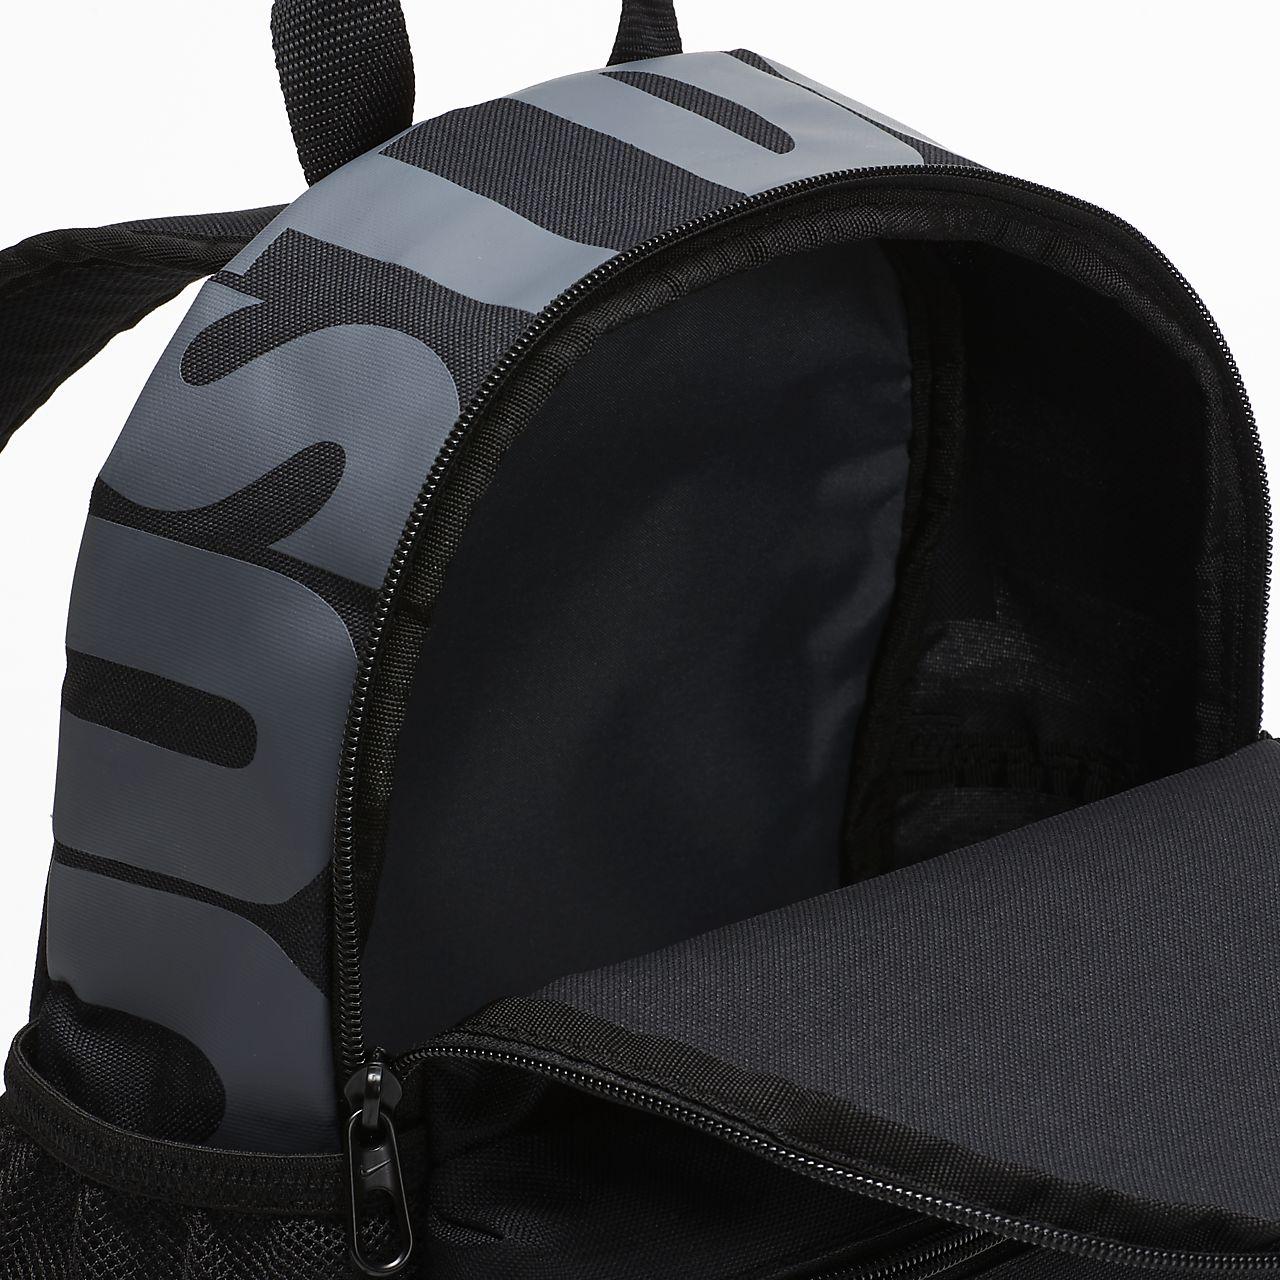 d9b2af7145f8 Nike Brasilia Just Do It Kids  Backpack (Mini). Nike.com